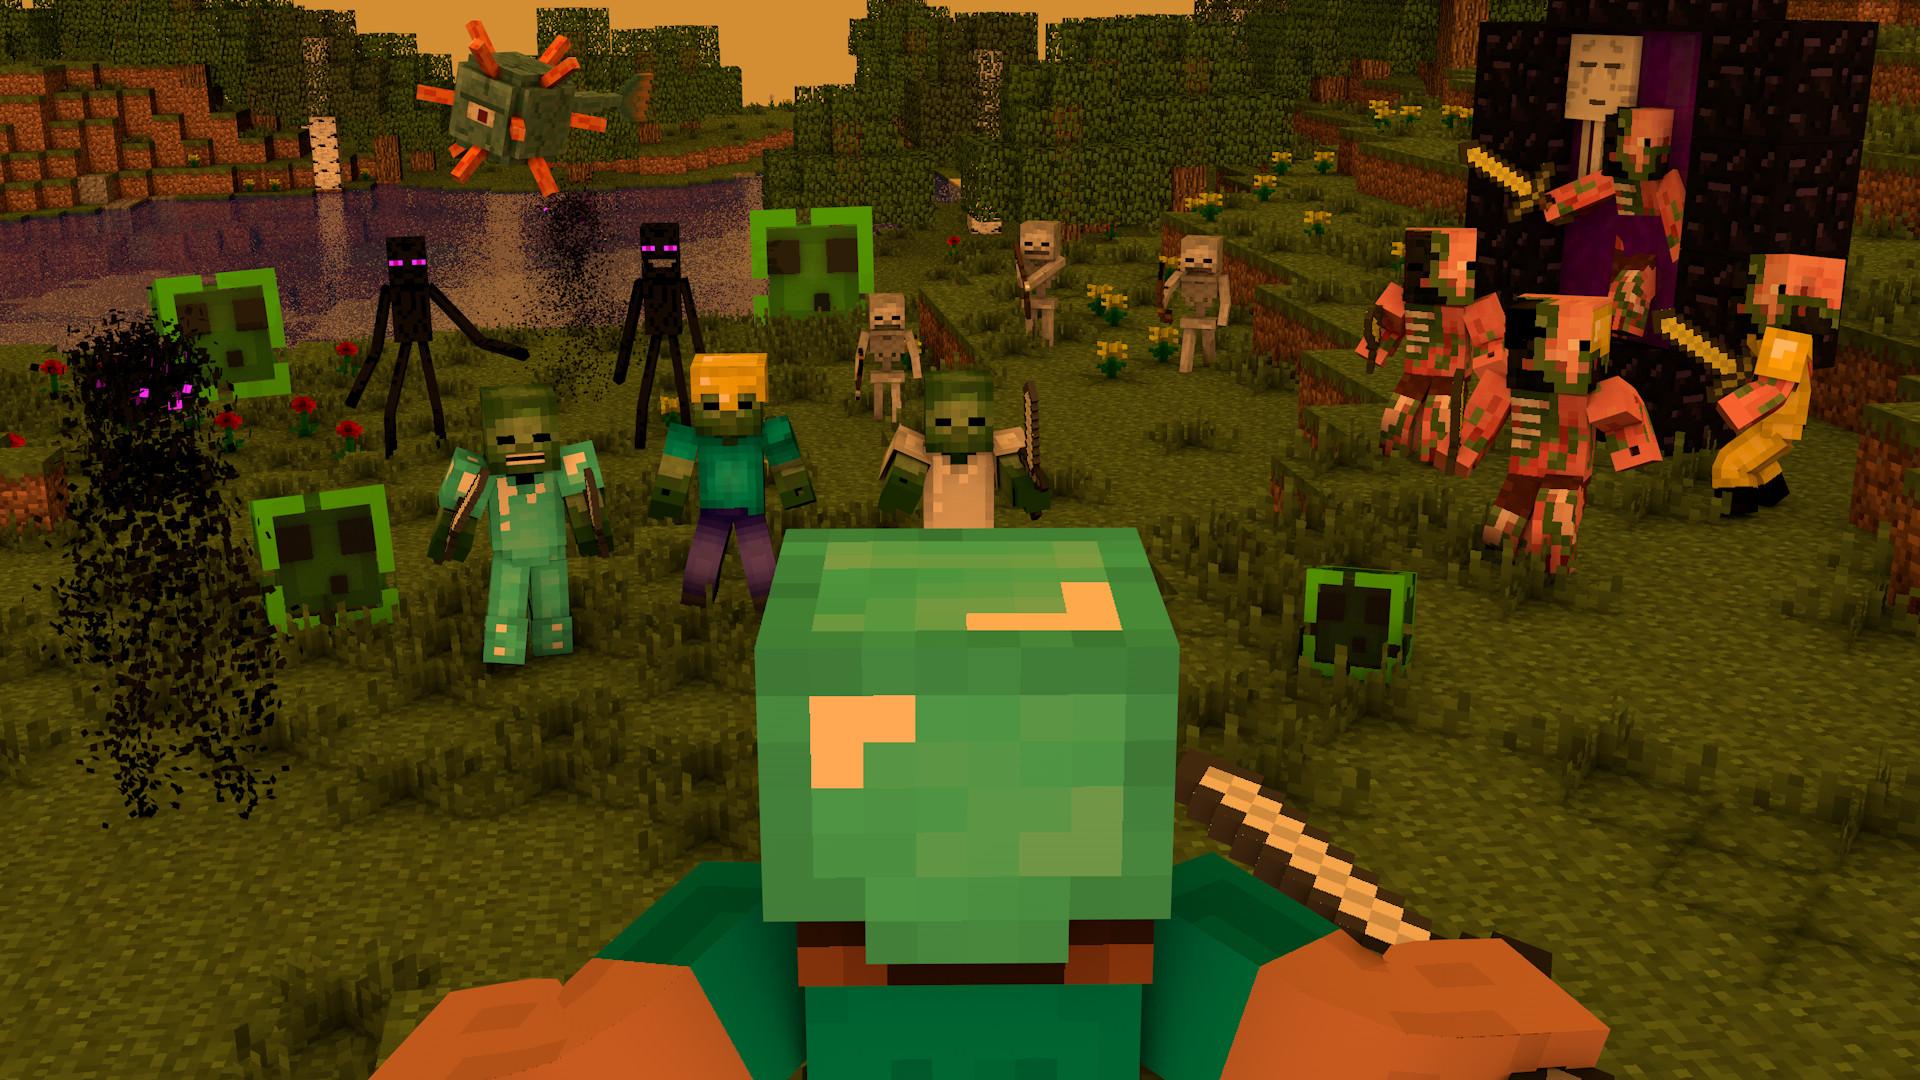 Res: 1920x1080, Computerspiele - Minecraft Mojang Computerspiele Zombie Pigman (Minecraft)  Steve (Minecraft) Skelett Zombie